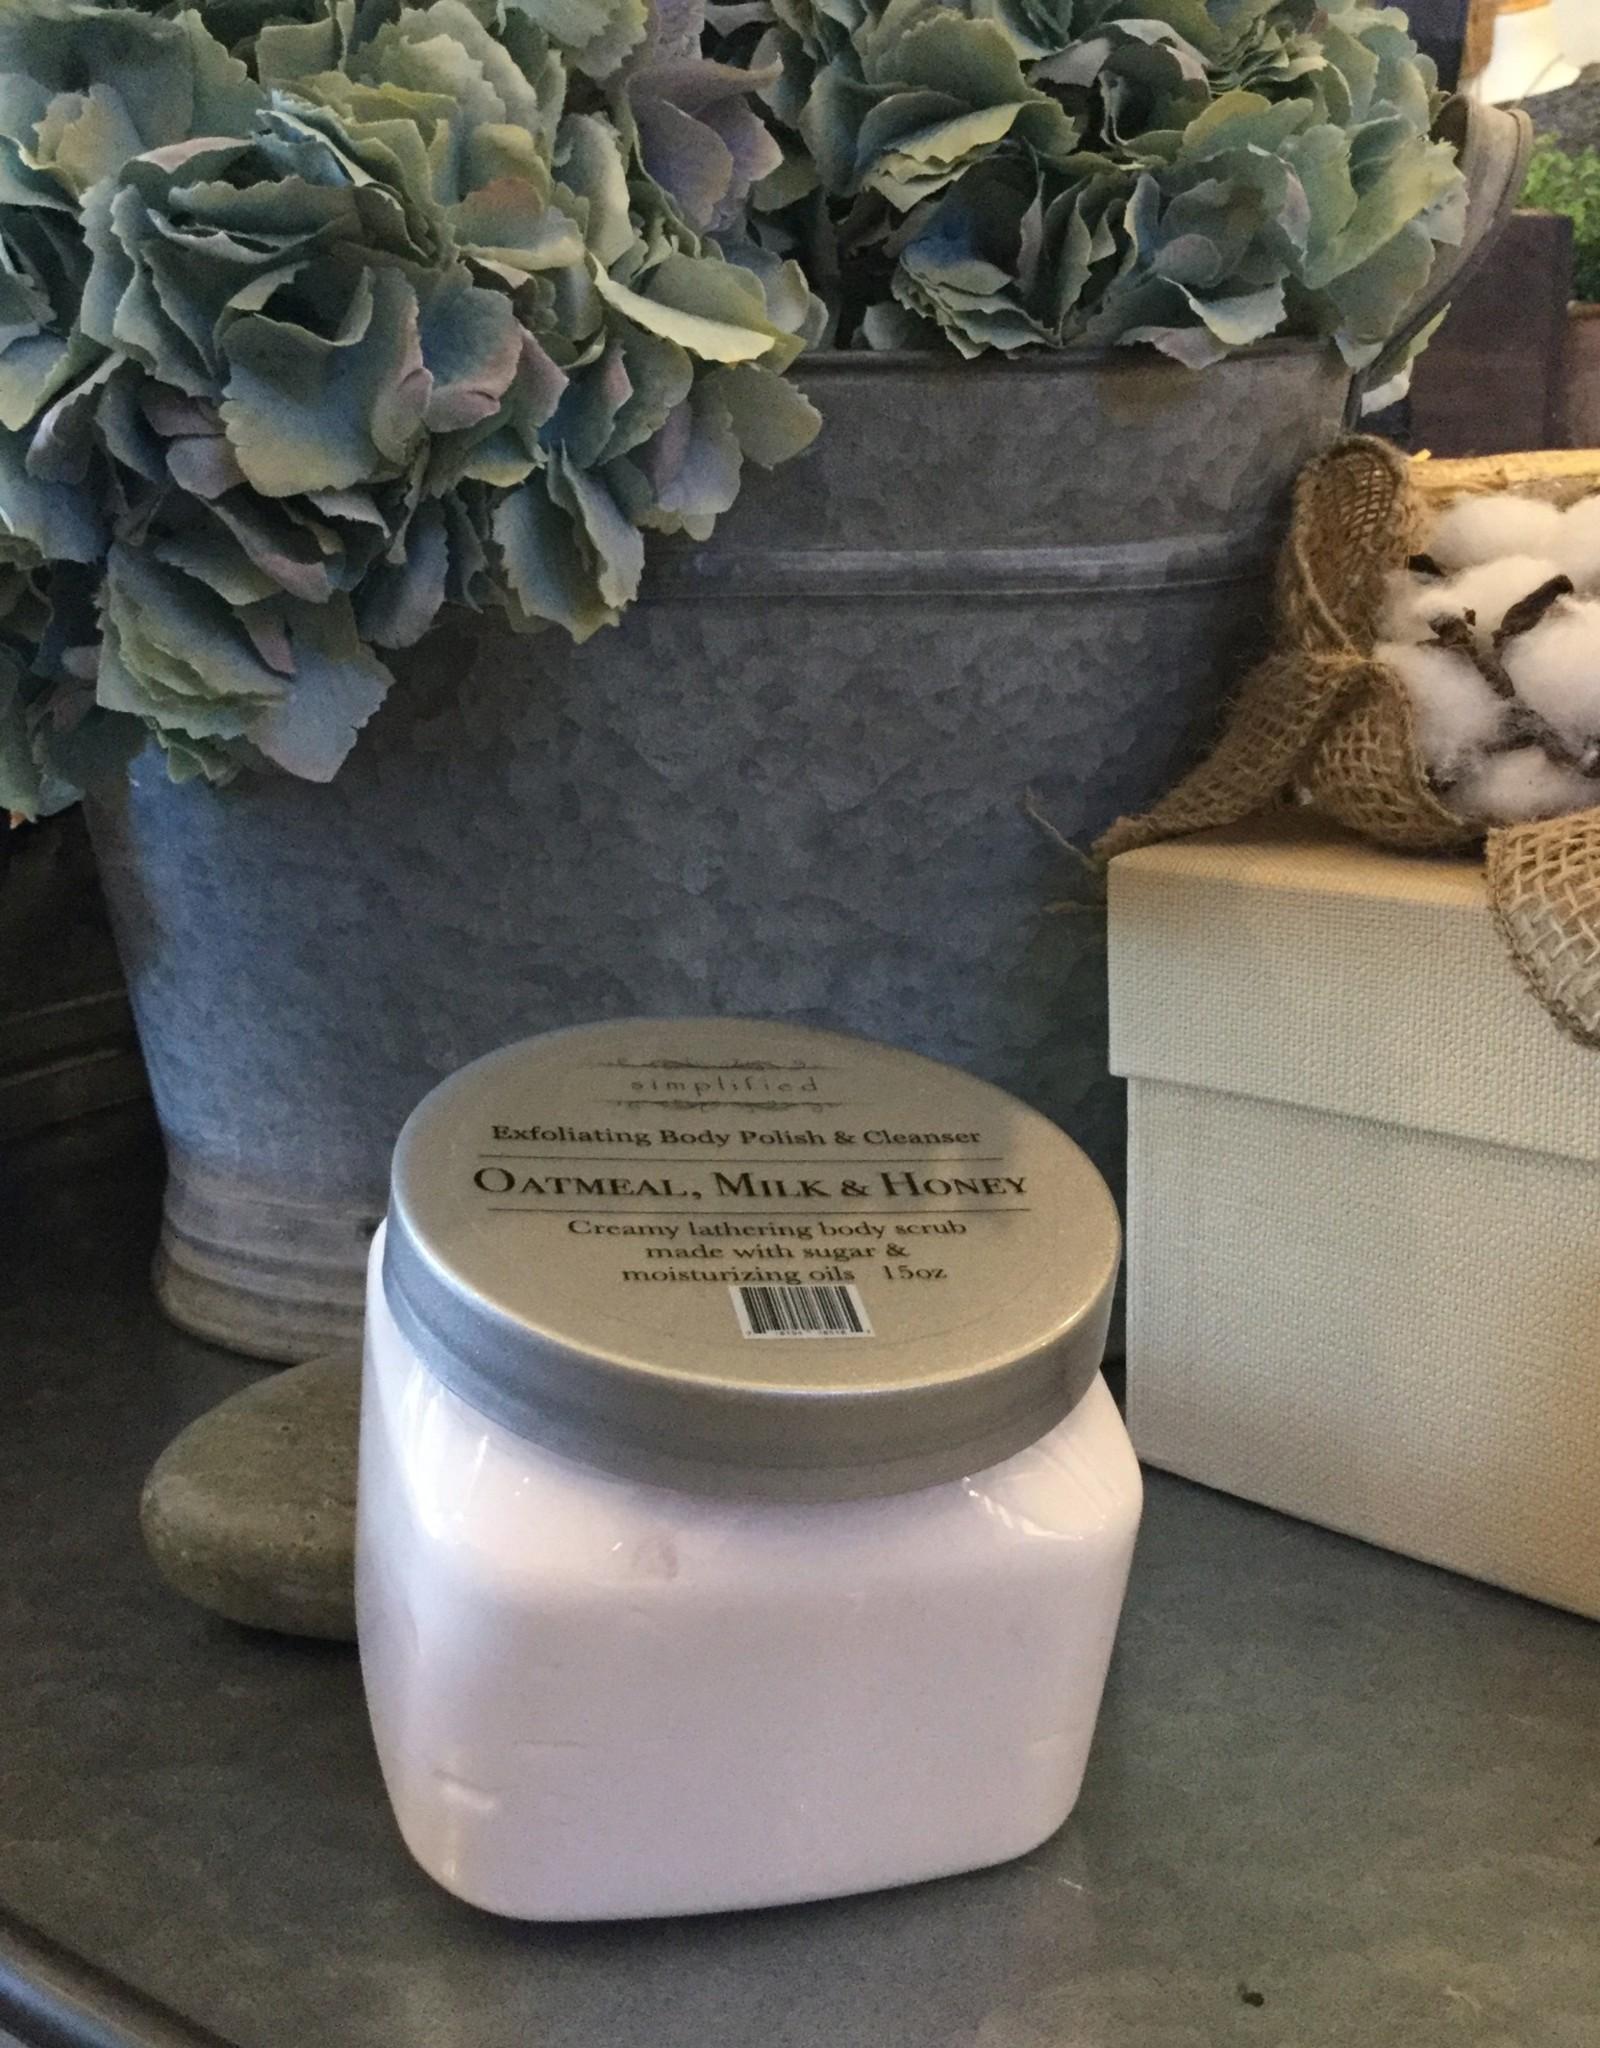 Body Polish 15 oz - Oatmeal, Milk, & Honey